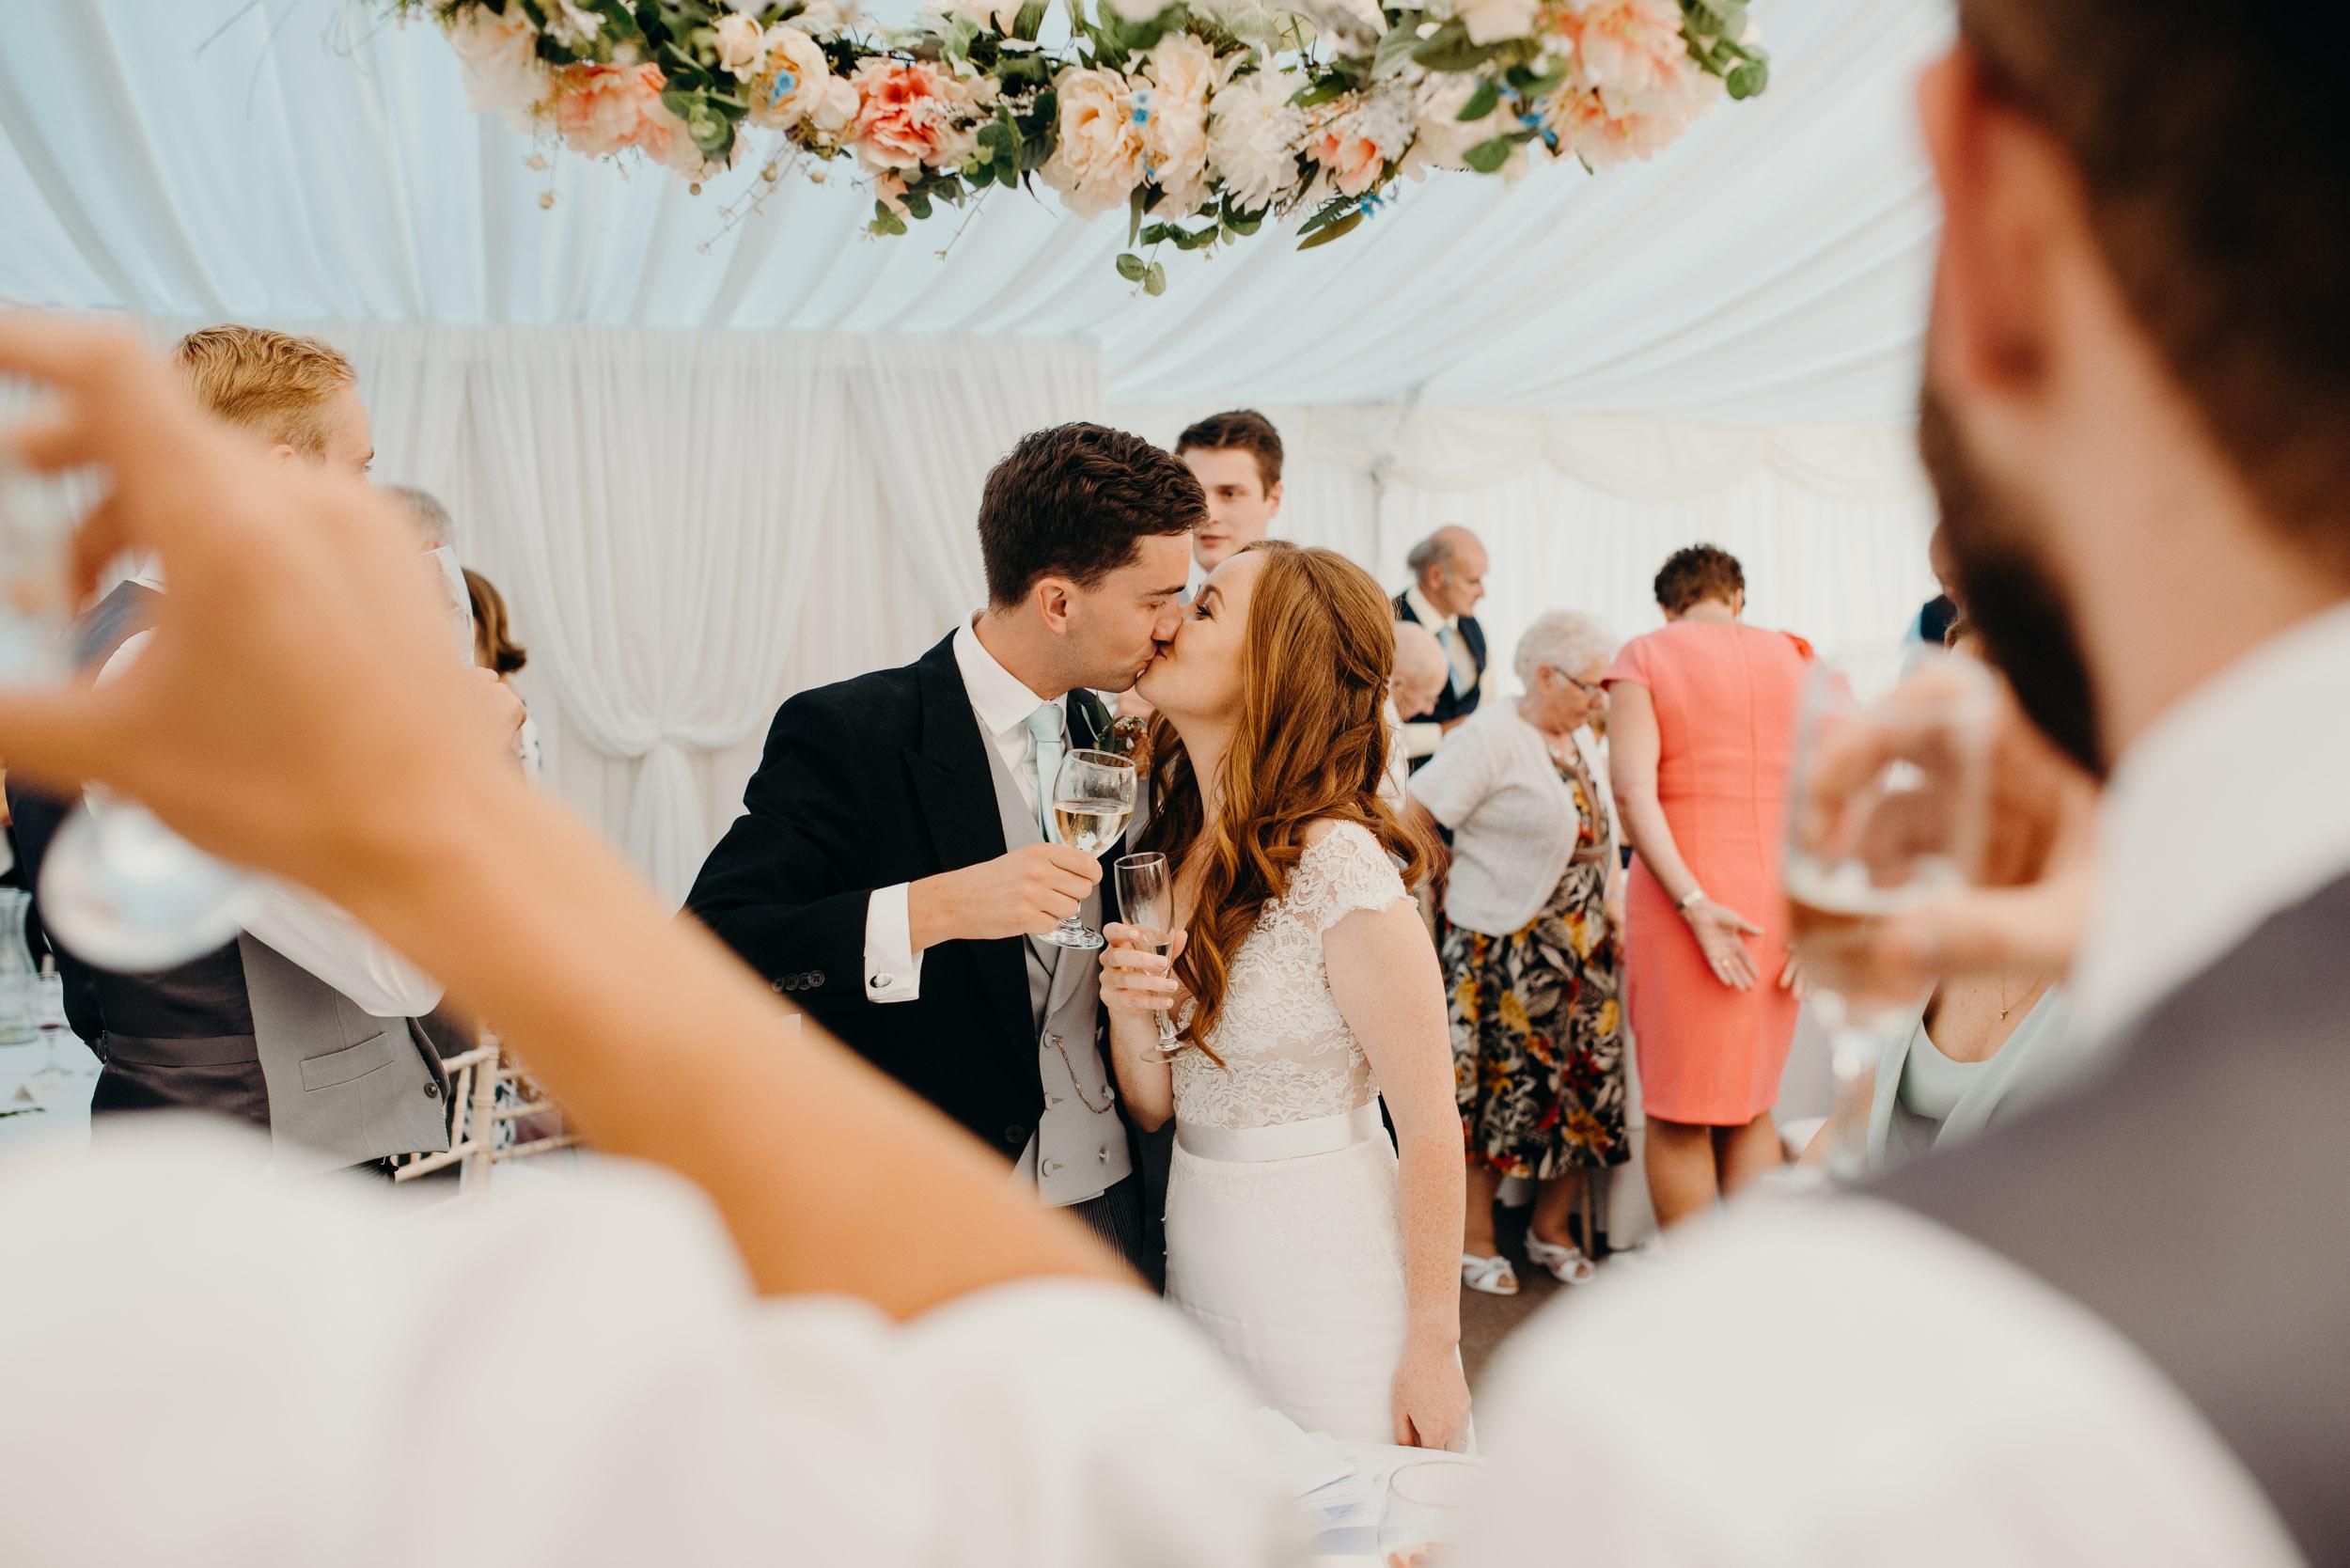 drenagh estate wedding photography-116.jpg